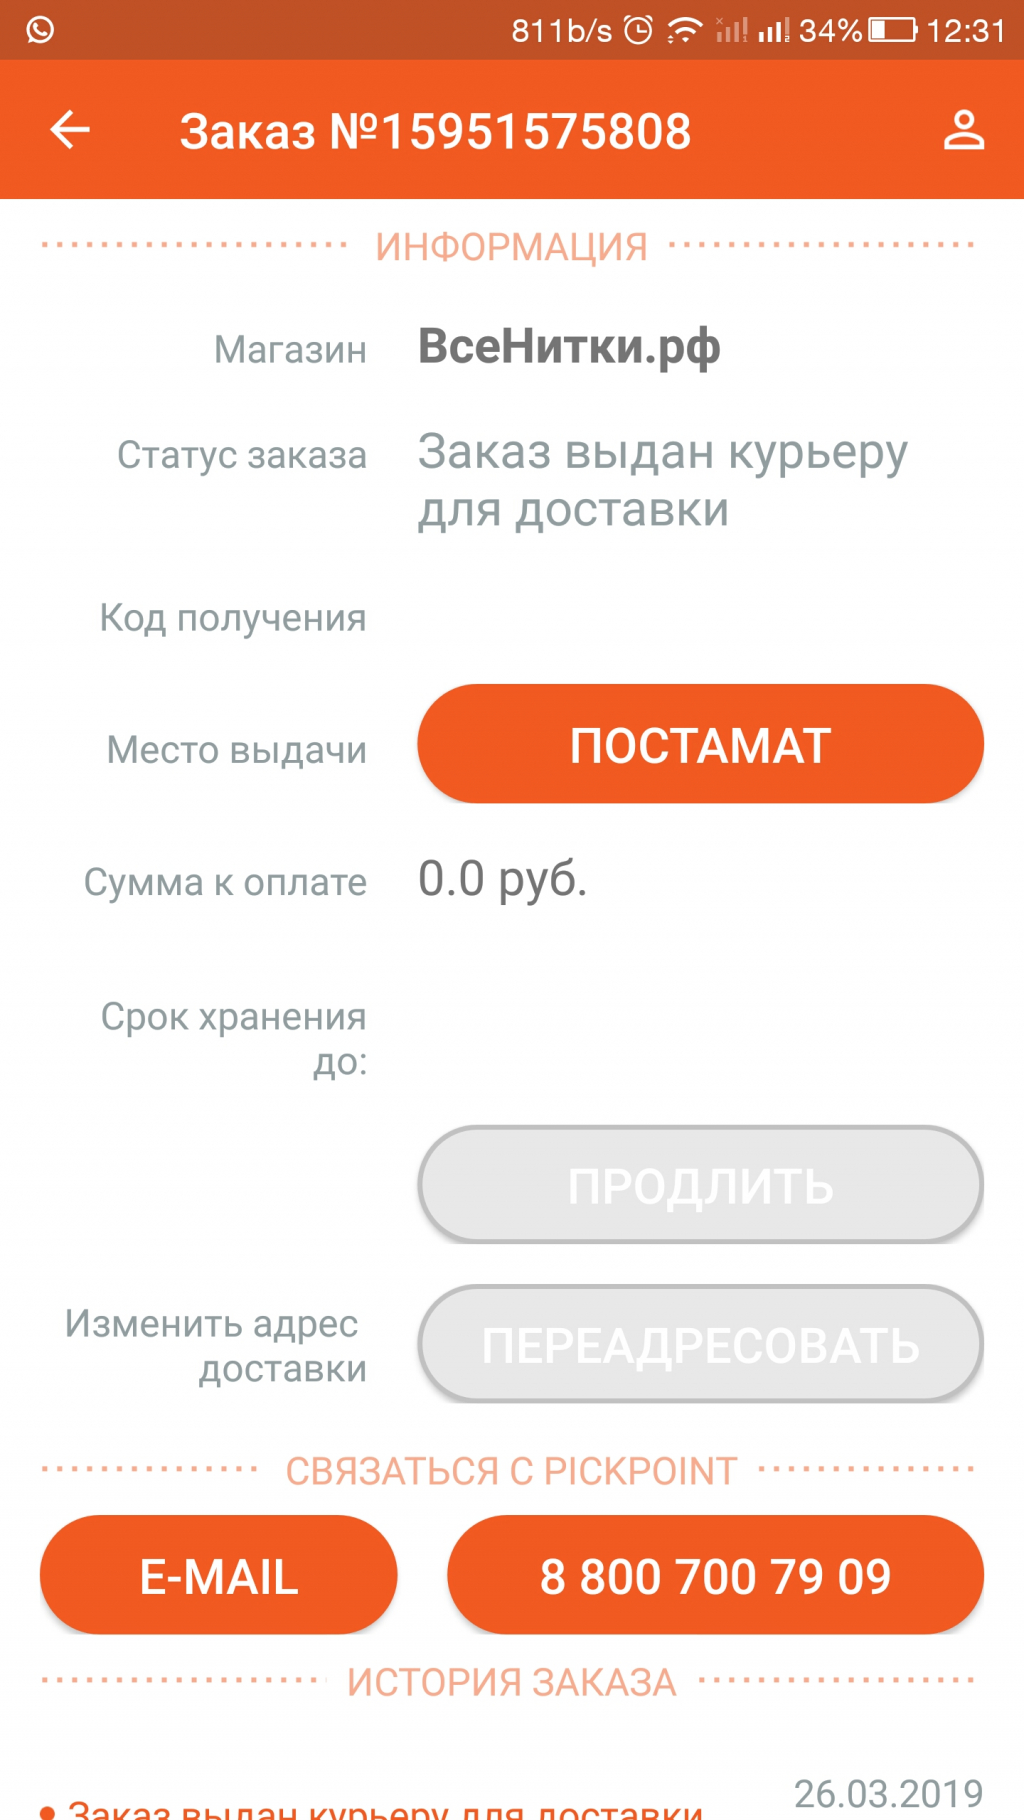 PickPoint - Шарашкина контора